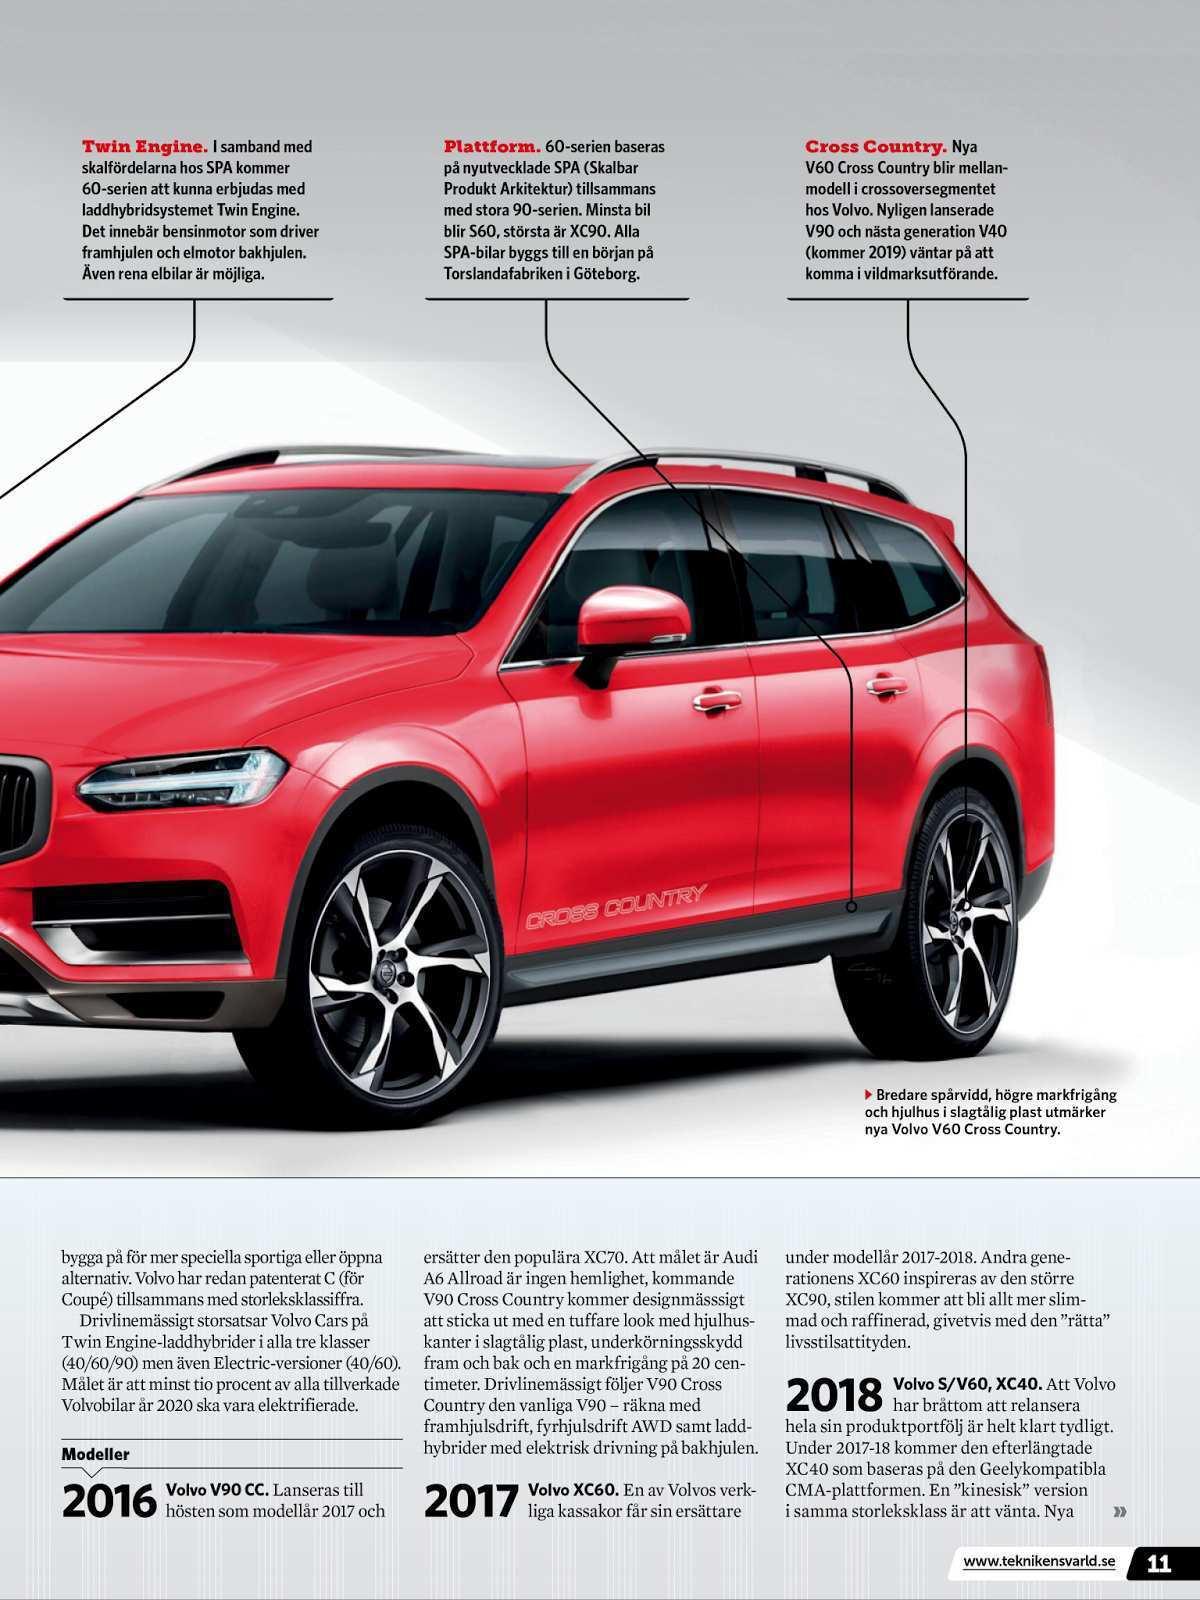 40 Concept of Volvo 2019 Modeller Style with Volvo 2019 Modeller